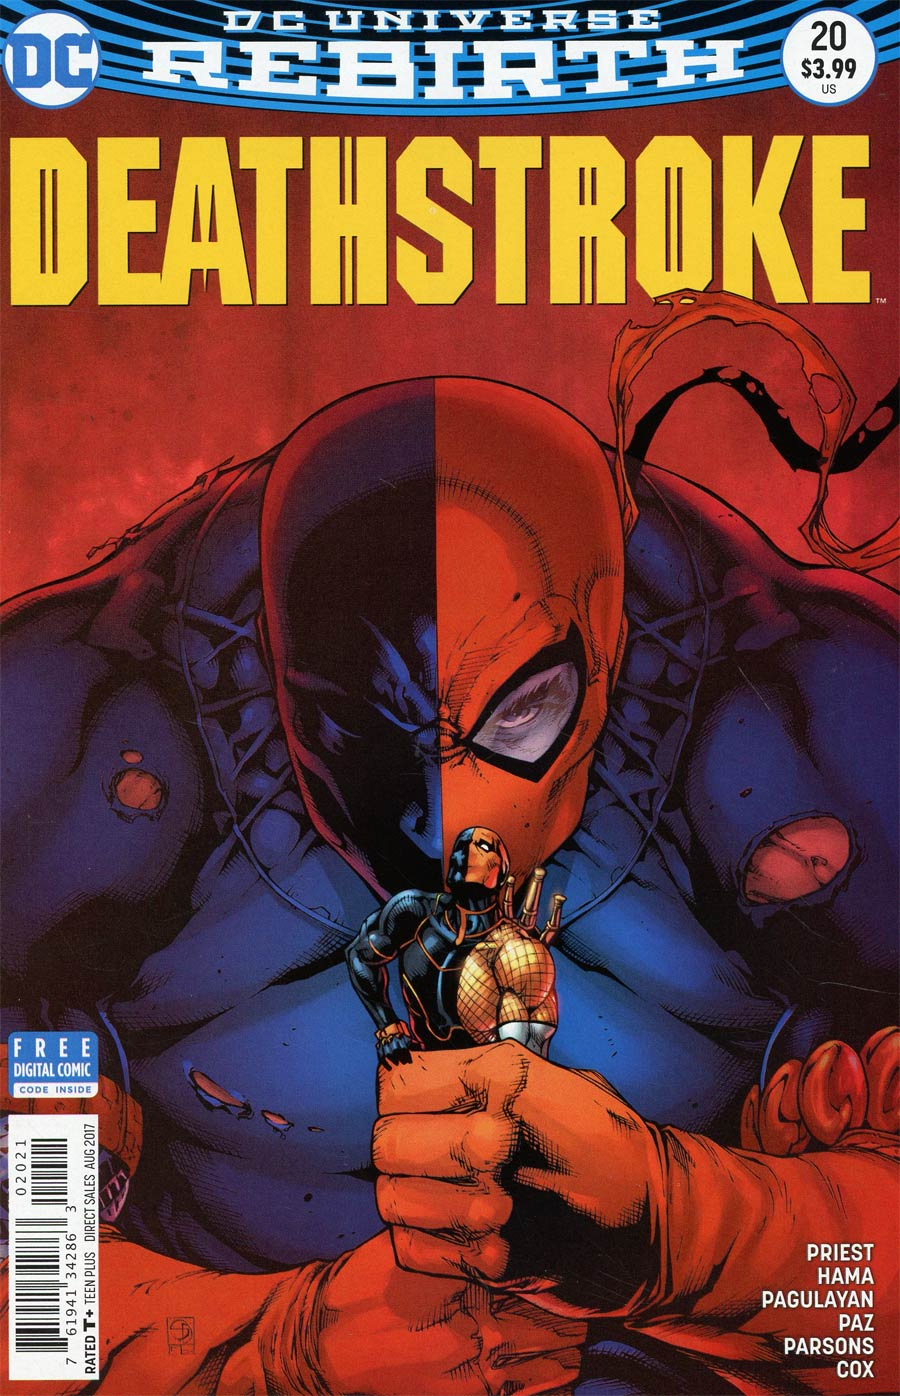 Deathstroke Vol 4 #20 Cover B Variant Shane Davis Cover (Lazarus Contract Epilogue)